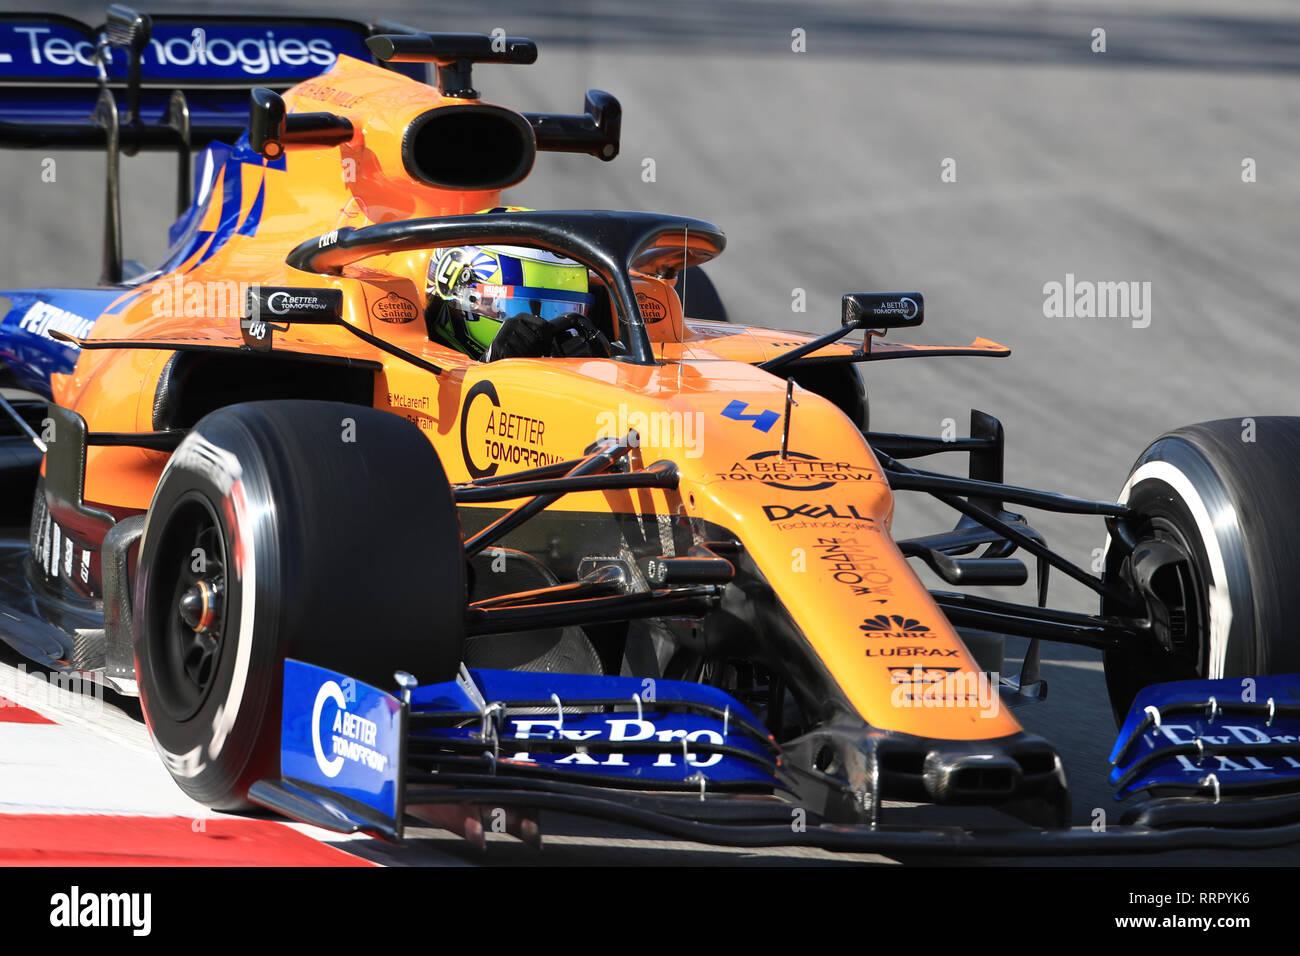 Circuit de Barcelona-Catalunya, Barcelona, Spain. 26th Feb, 2019. Formula One Testing Day 5; McLaren, Lando Norris Credit: Action Plus Sports/Alamy Live News Stock Photo